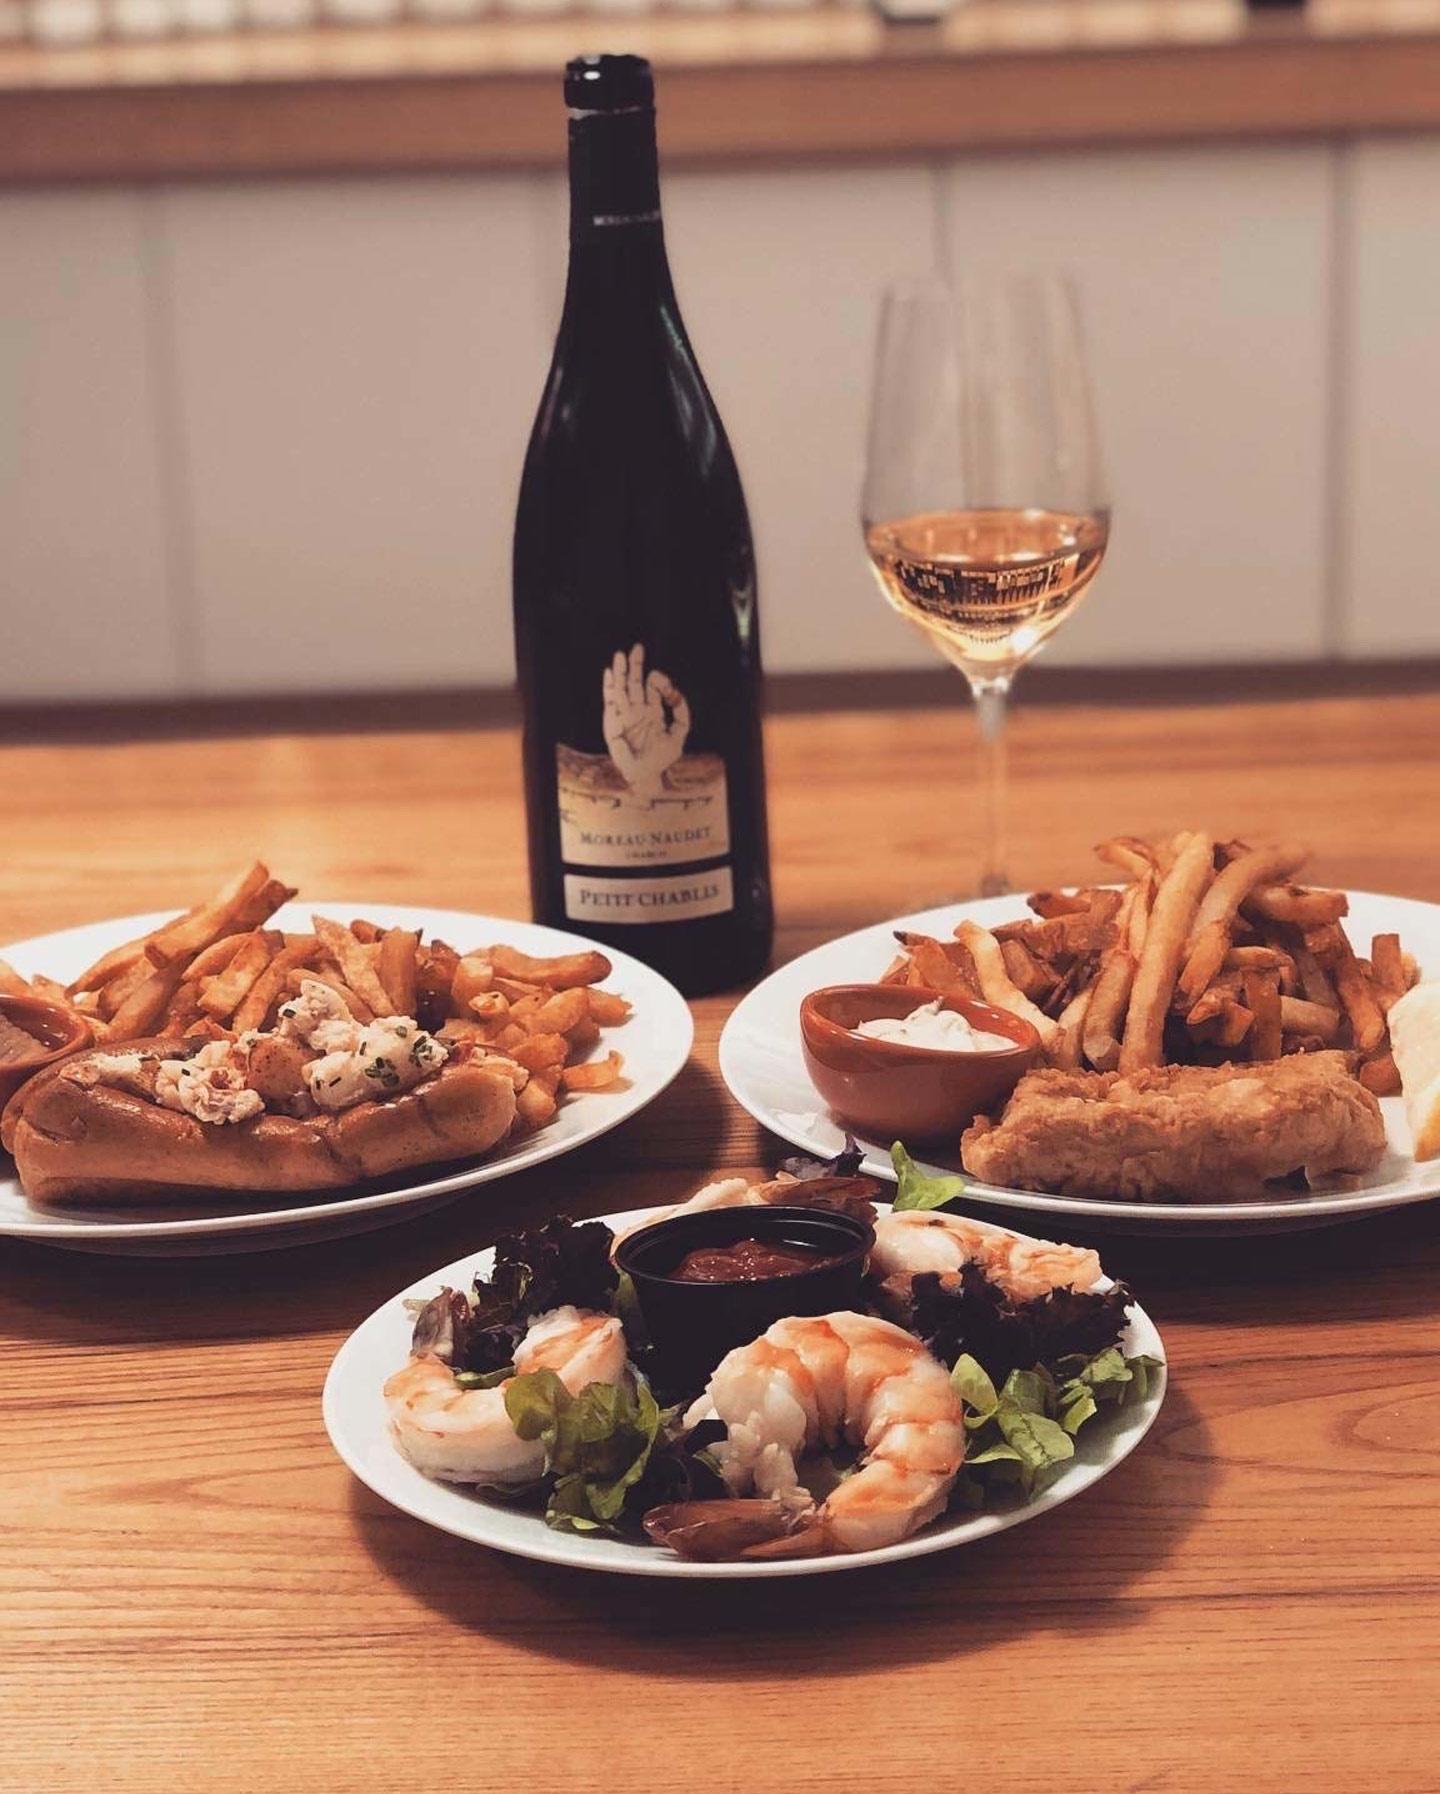 Eds Lobster Bar + Moreau Naudet Petit Chablis